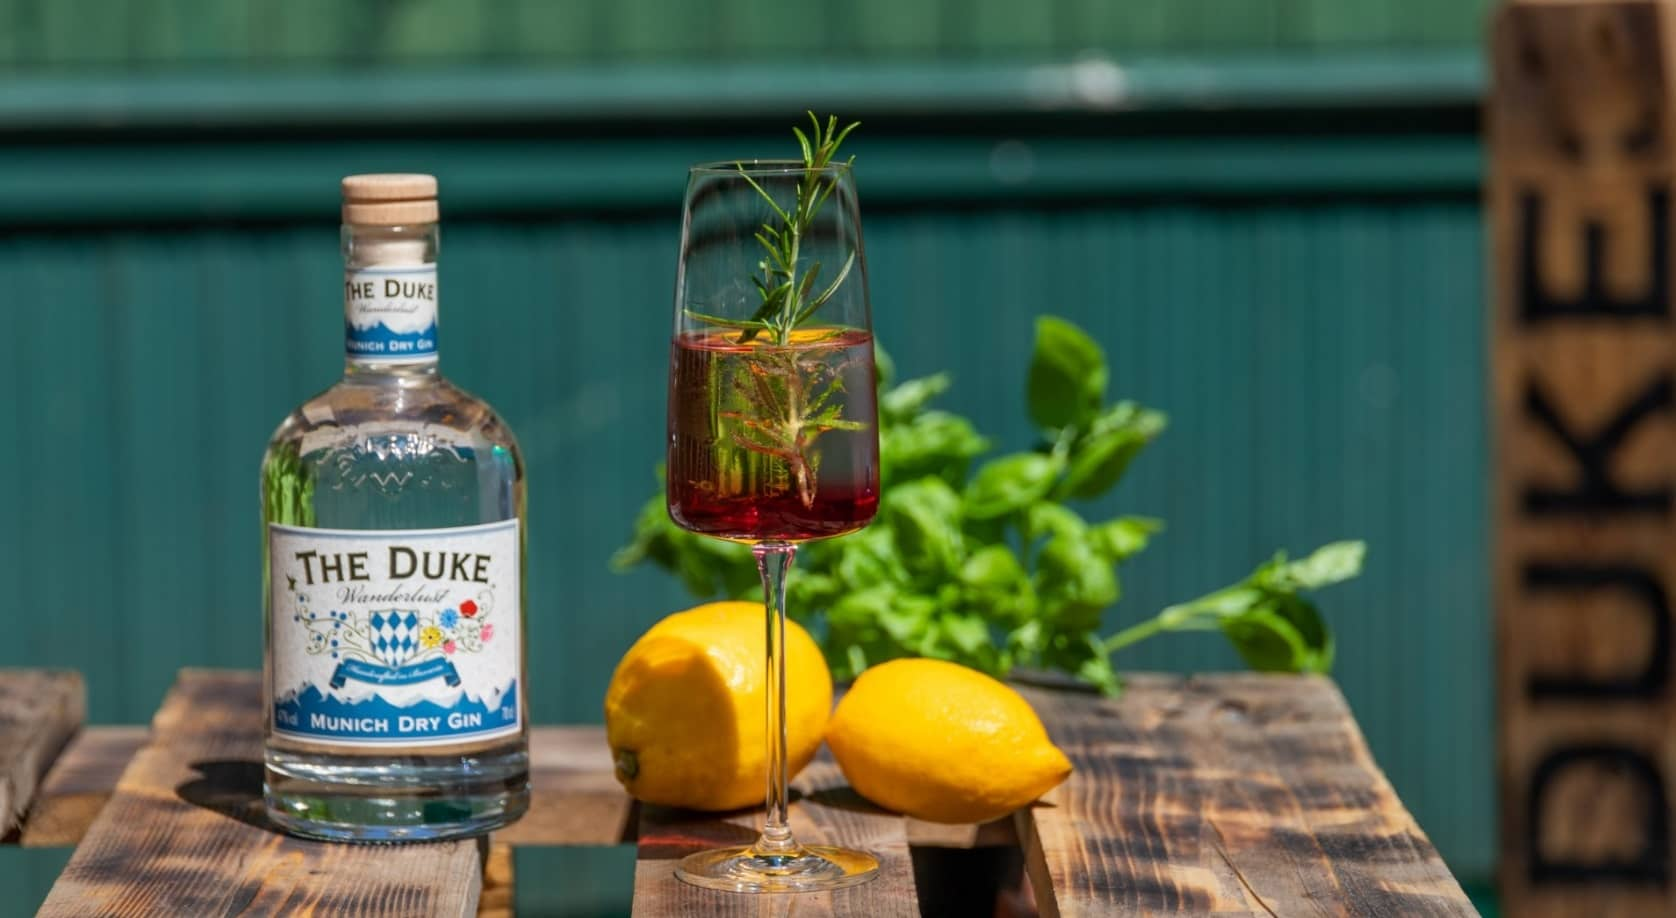 The Duke Gin Test & Tasting